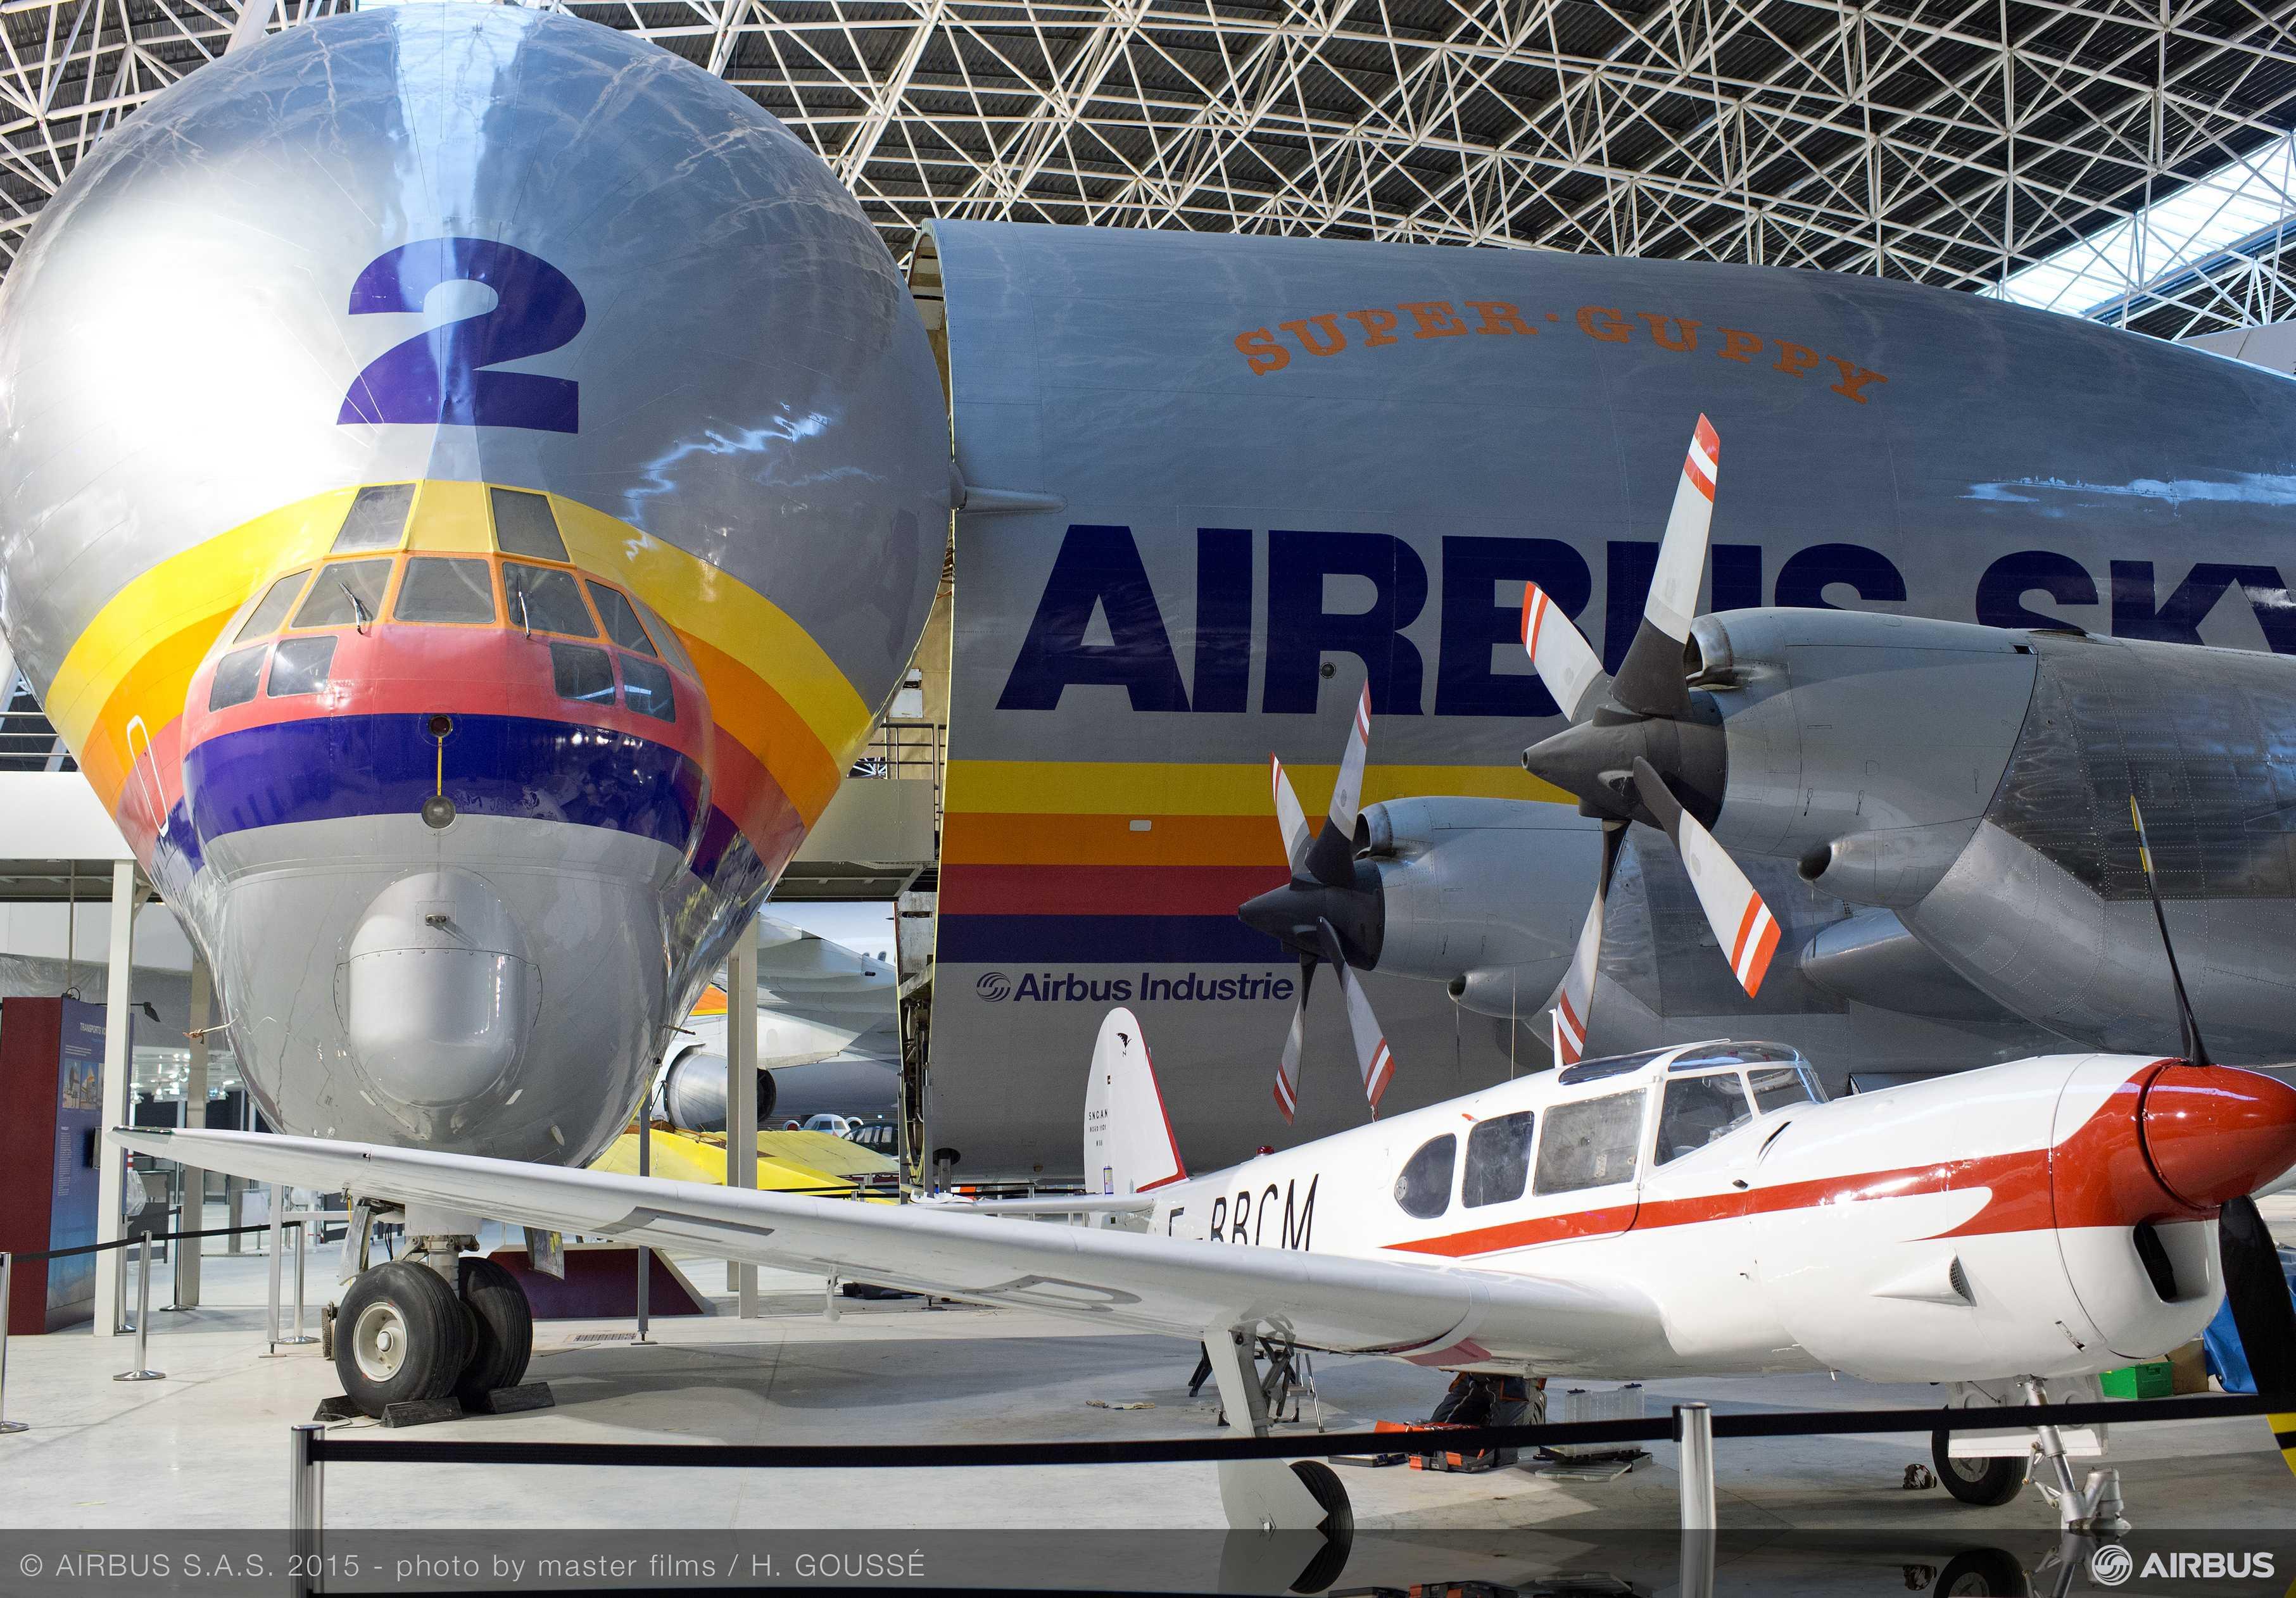 Aeroscopia_museum_aircraft_display_2